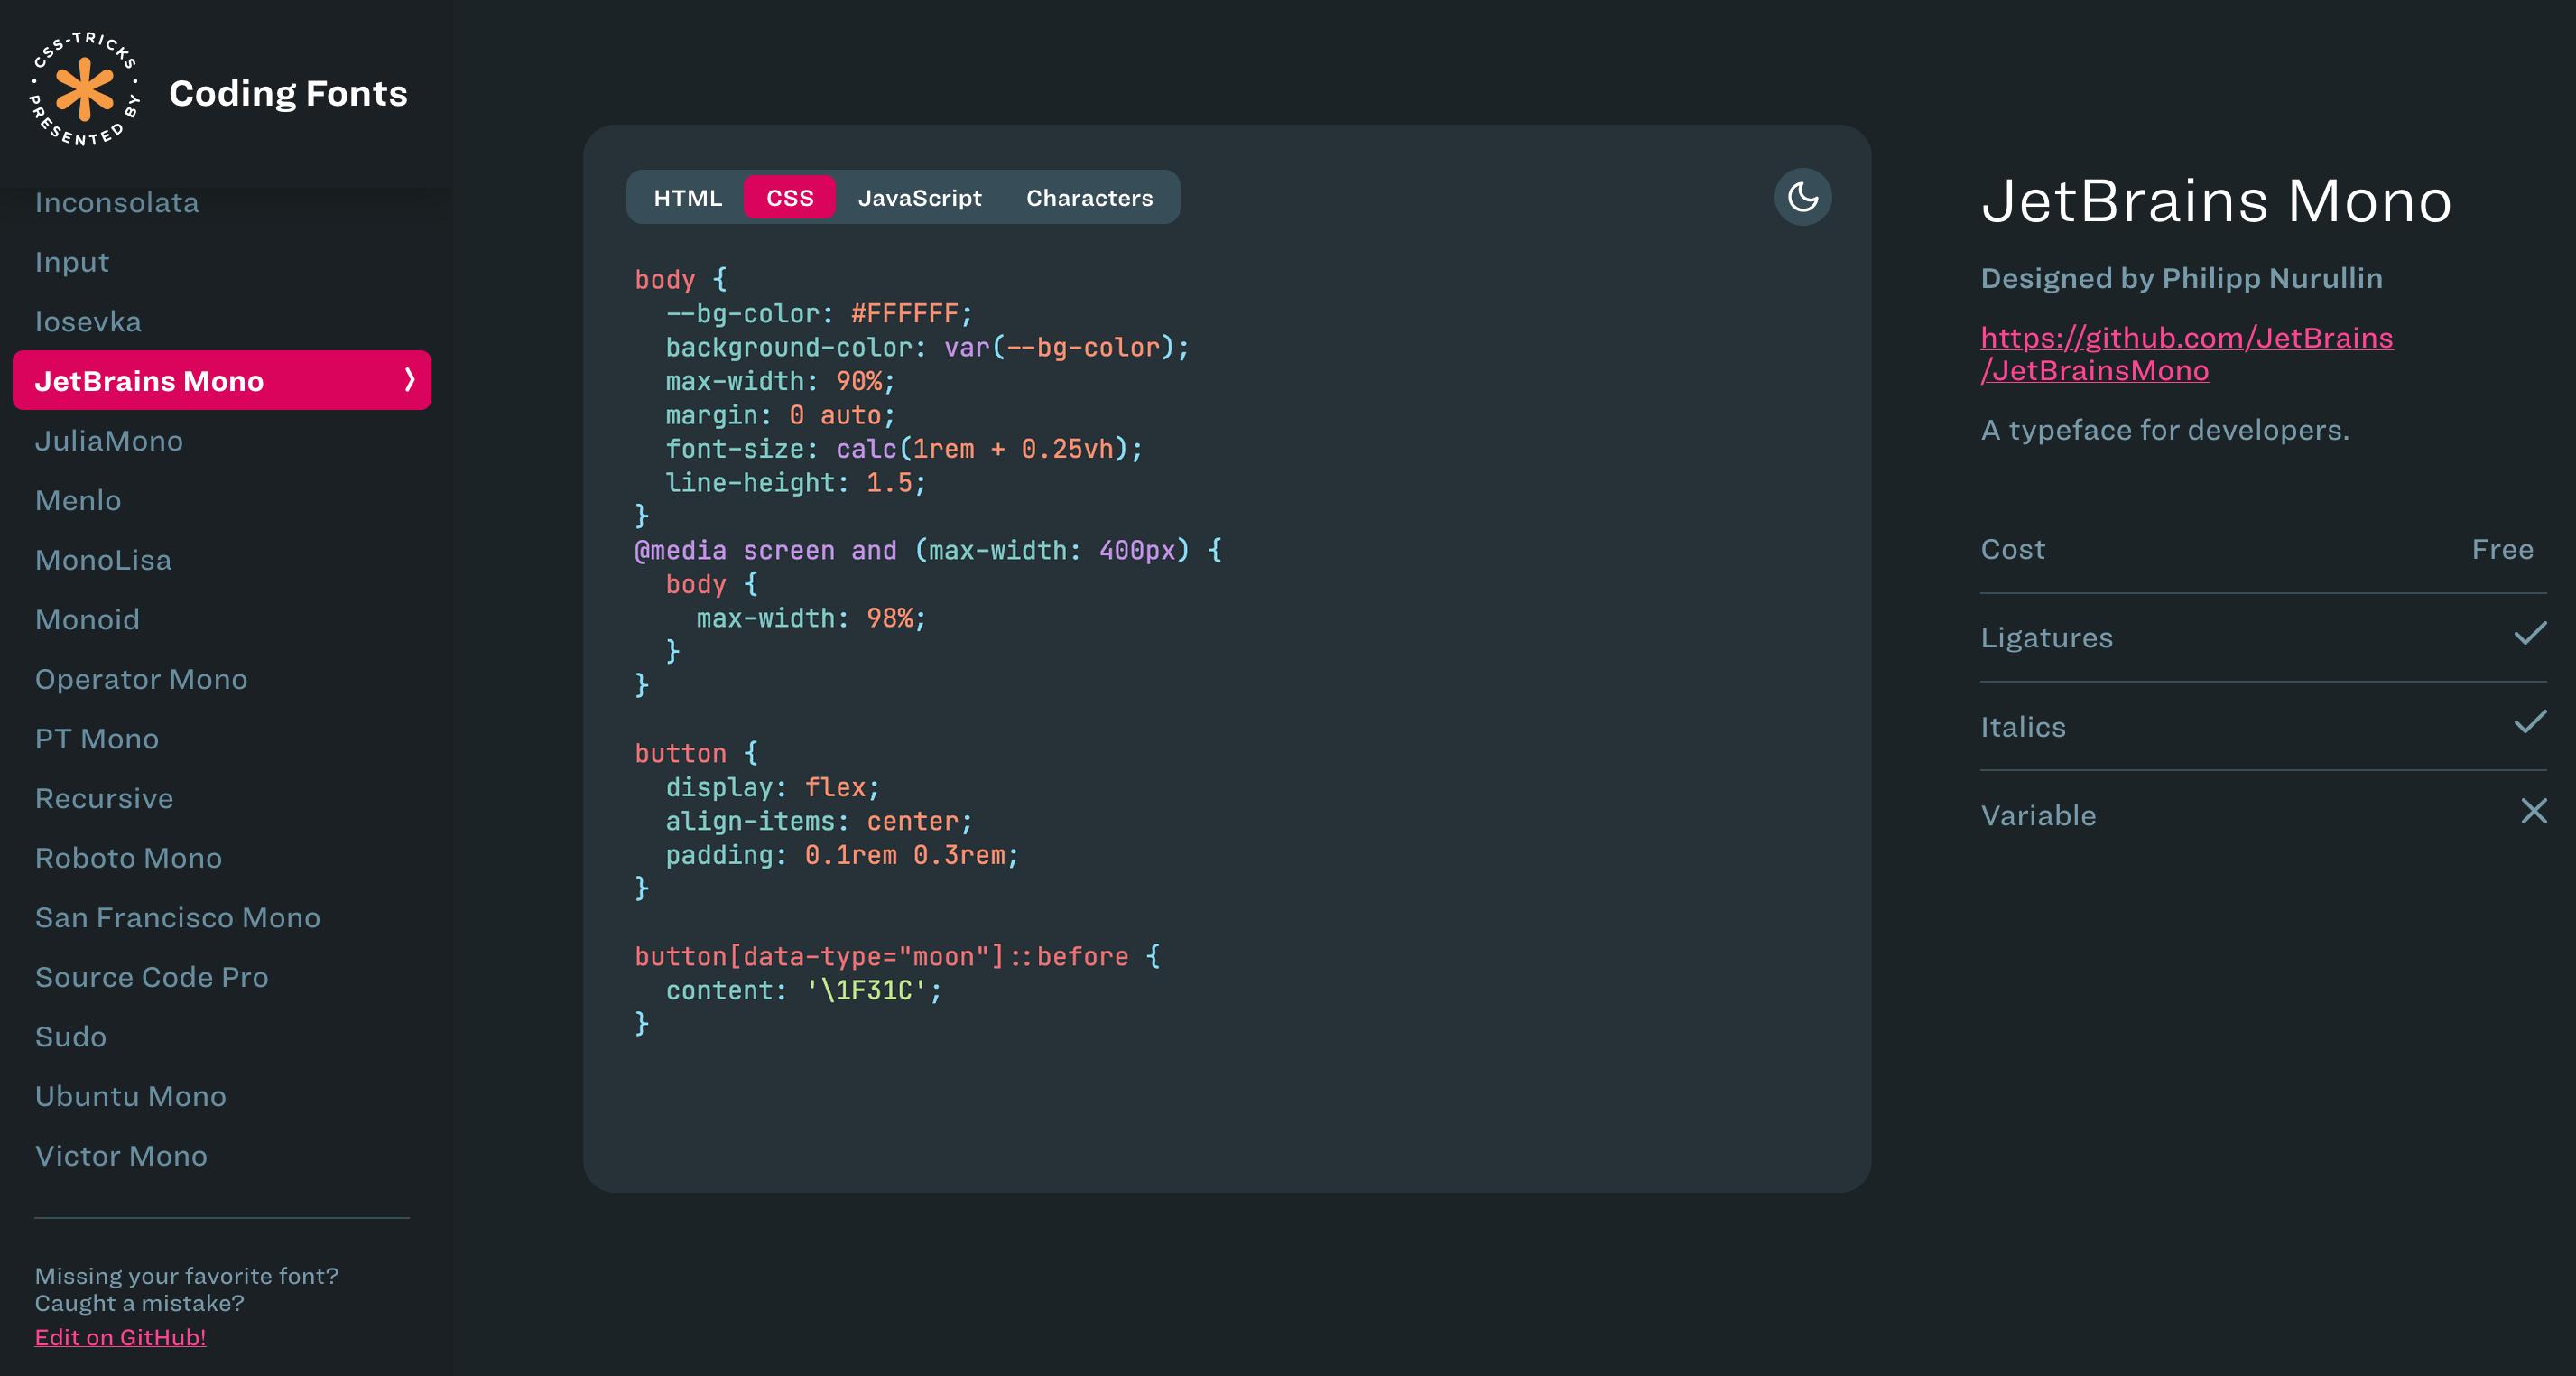 Coding fonts on css-tricks.com